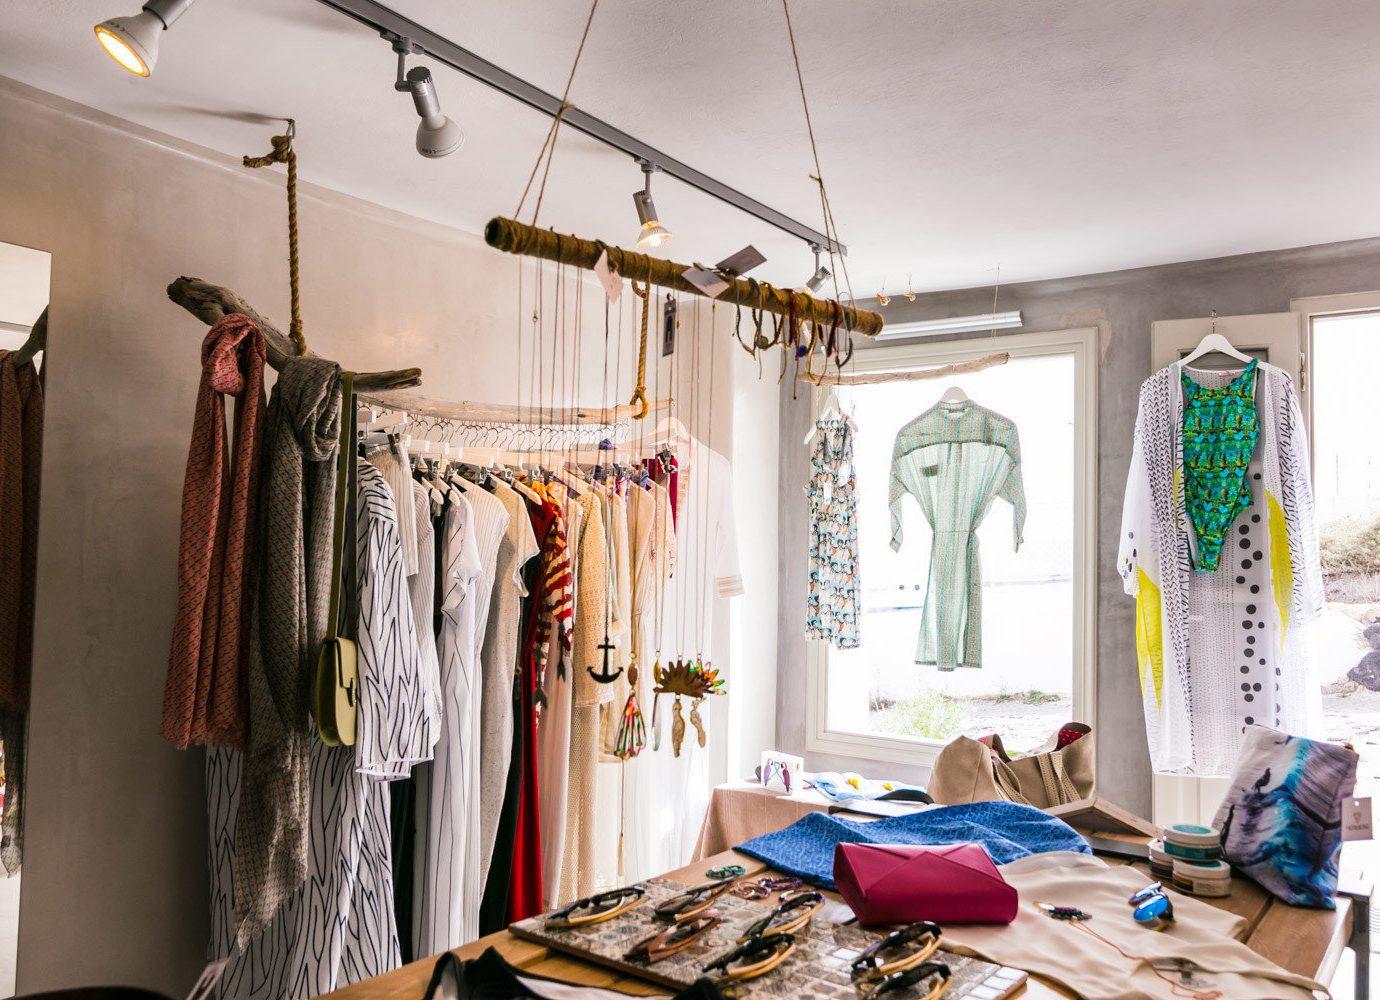 Trip Ideas indoor wall room Boutique interior design retail closet Bedroom furniture